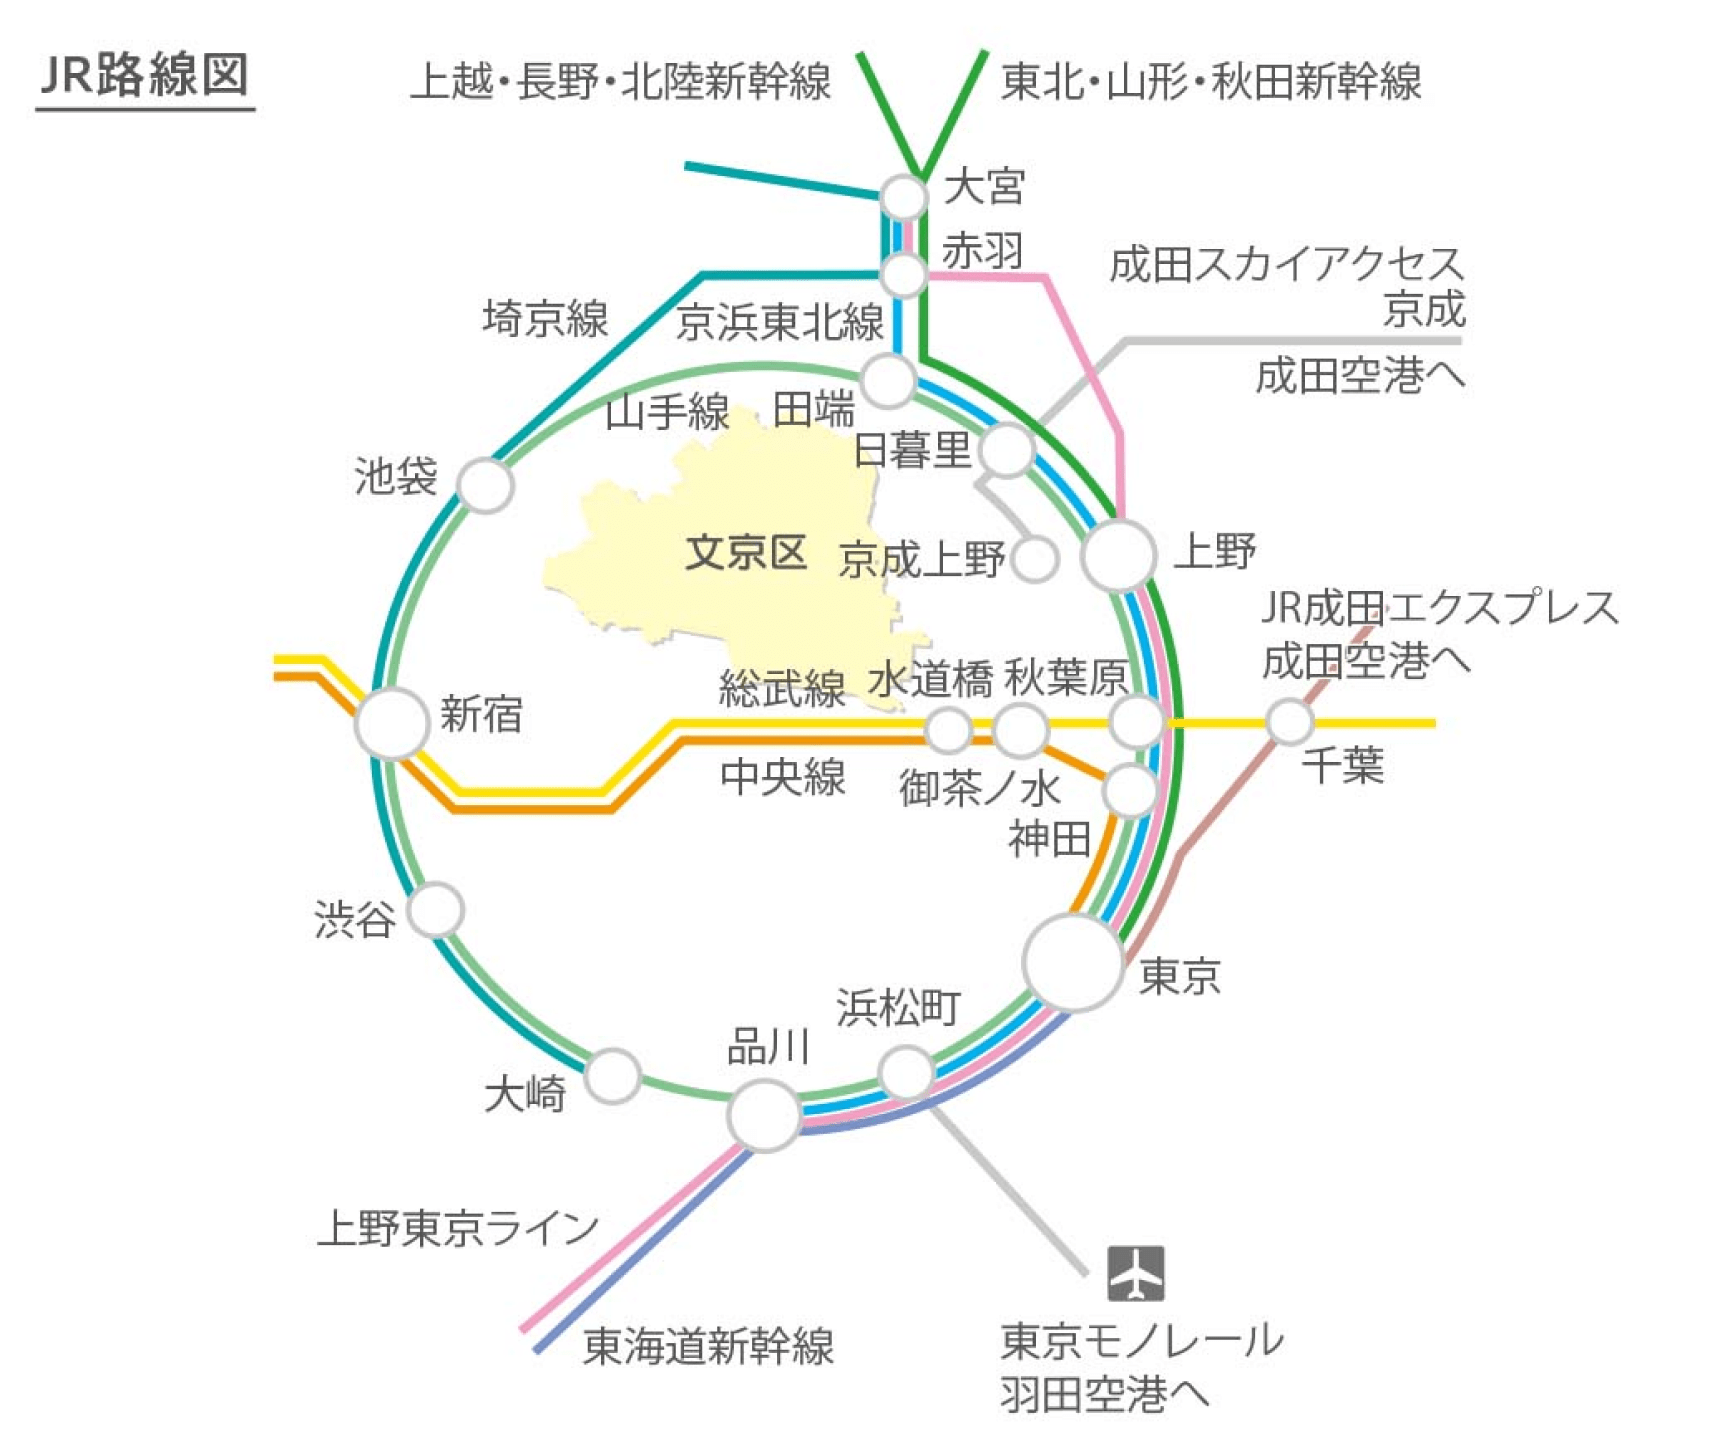 JR路線図:文京区を中心に、JRの路線や駅名が記載された図